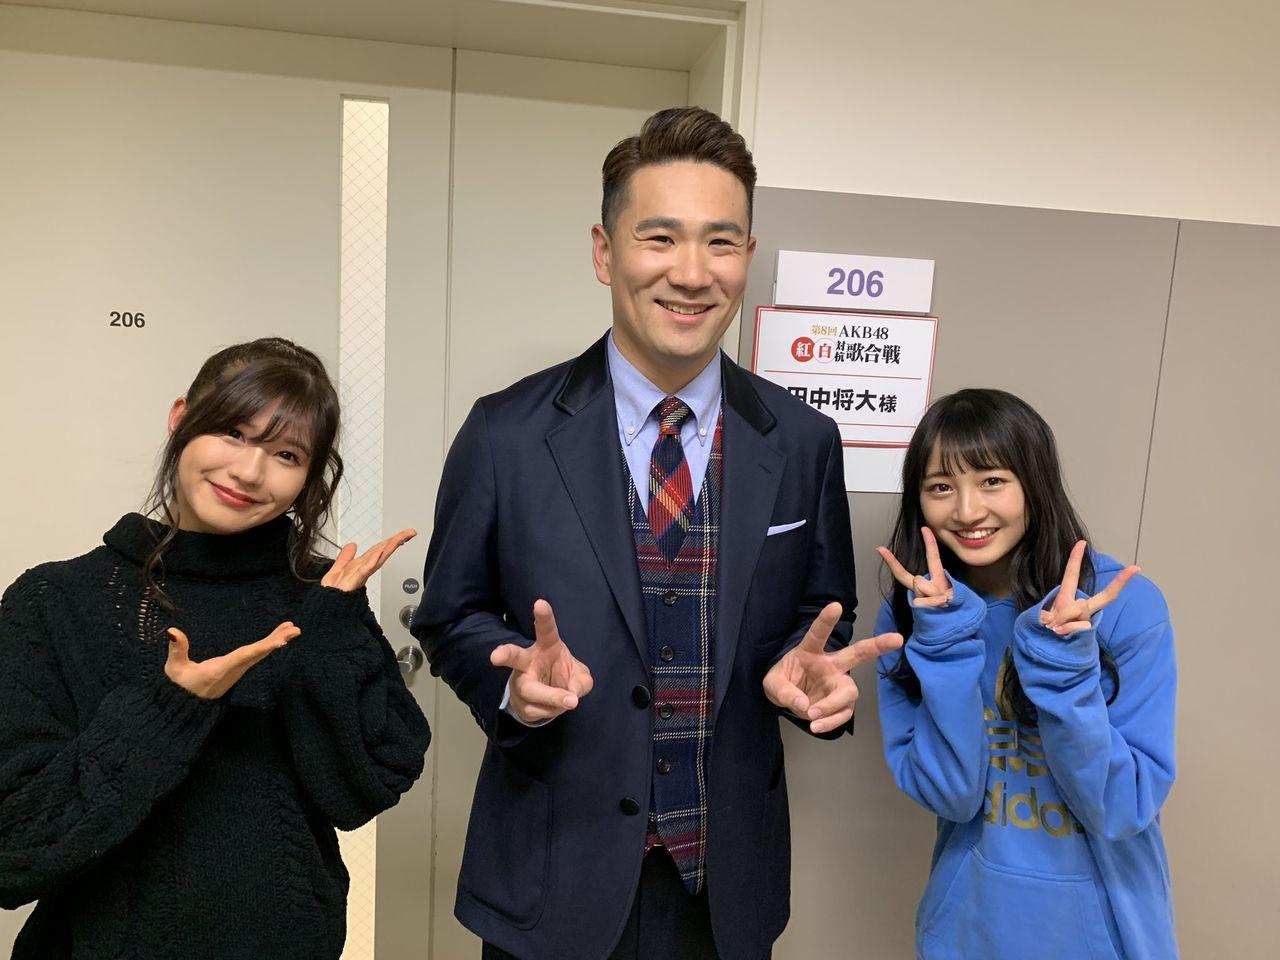 【NMB48】田中マー君、阪神関係者と接触キタ━━(゚∀゚)━━!!【谷川愛梨/山本彩加】